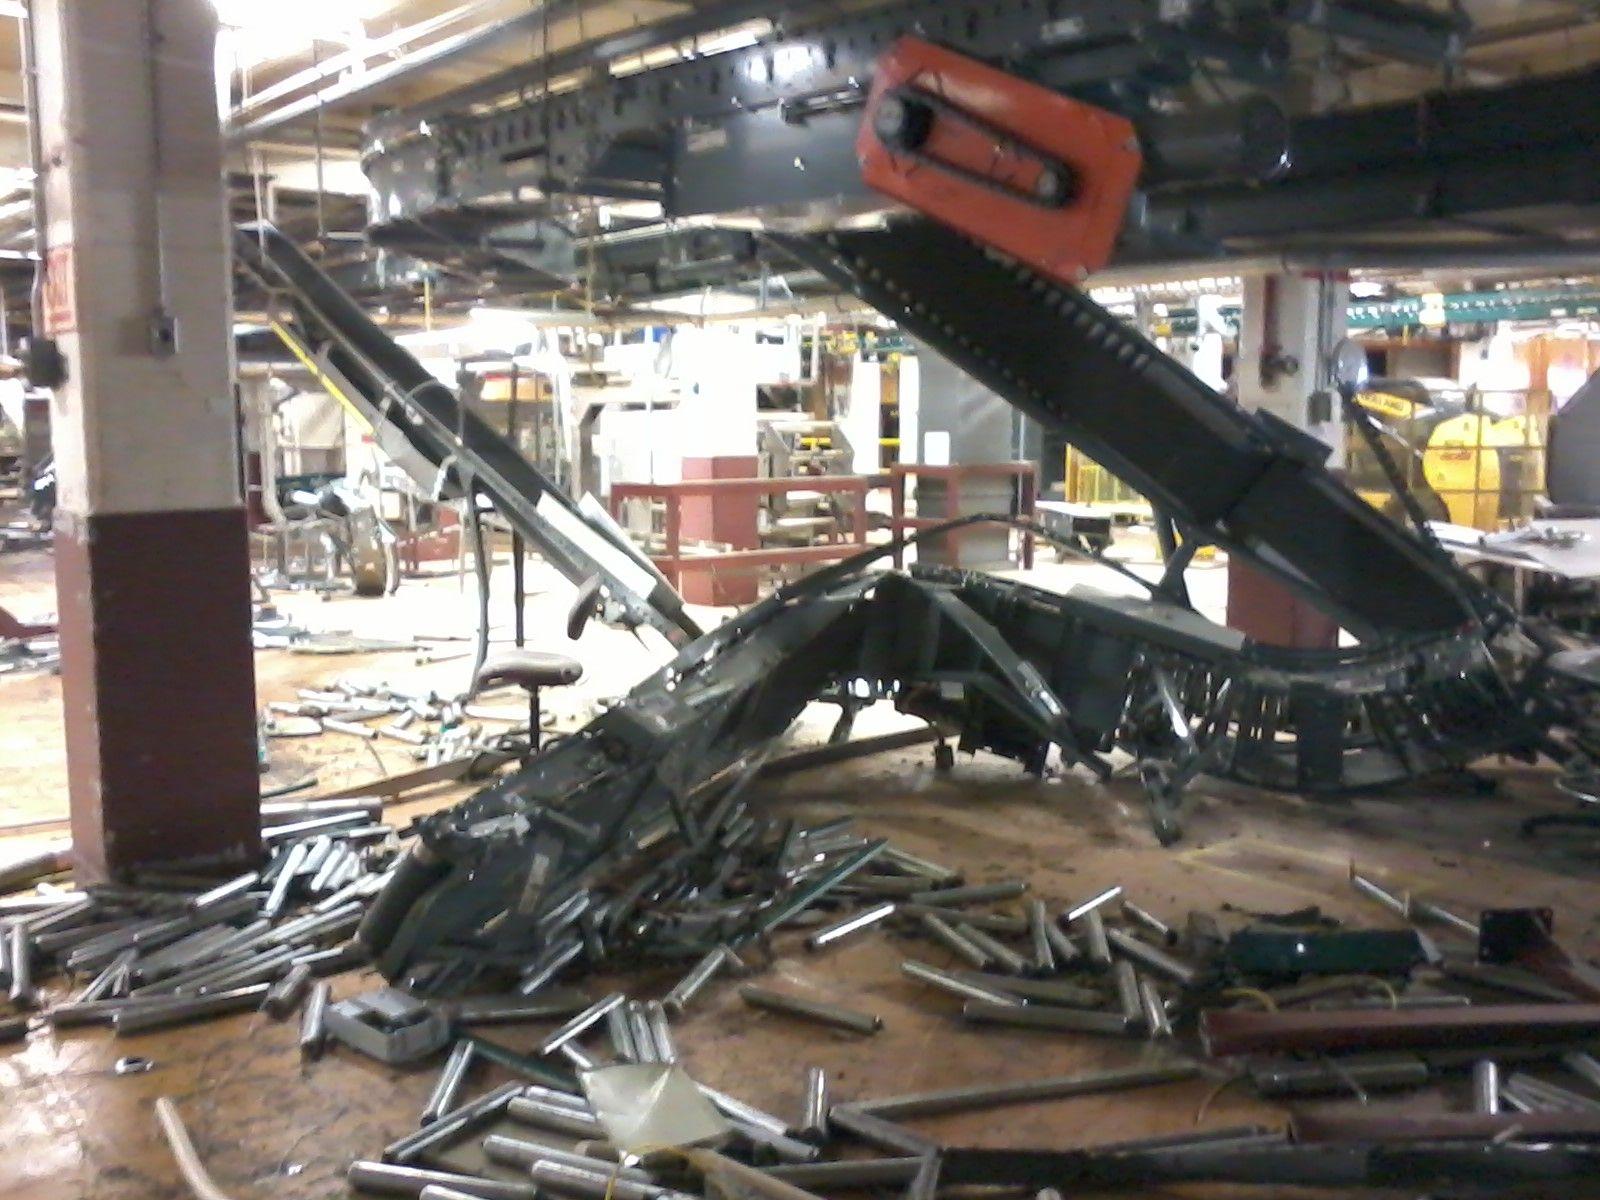 Scrapped Conveyor Belt In Building 33 Tm 2012 Chocolate Factory Hershey Factory American Chocolate